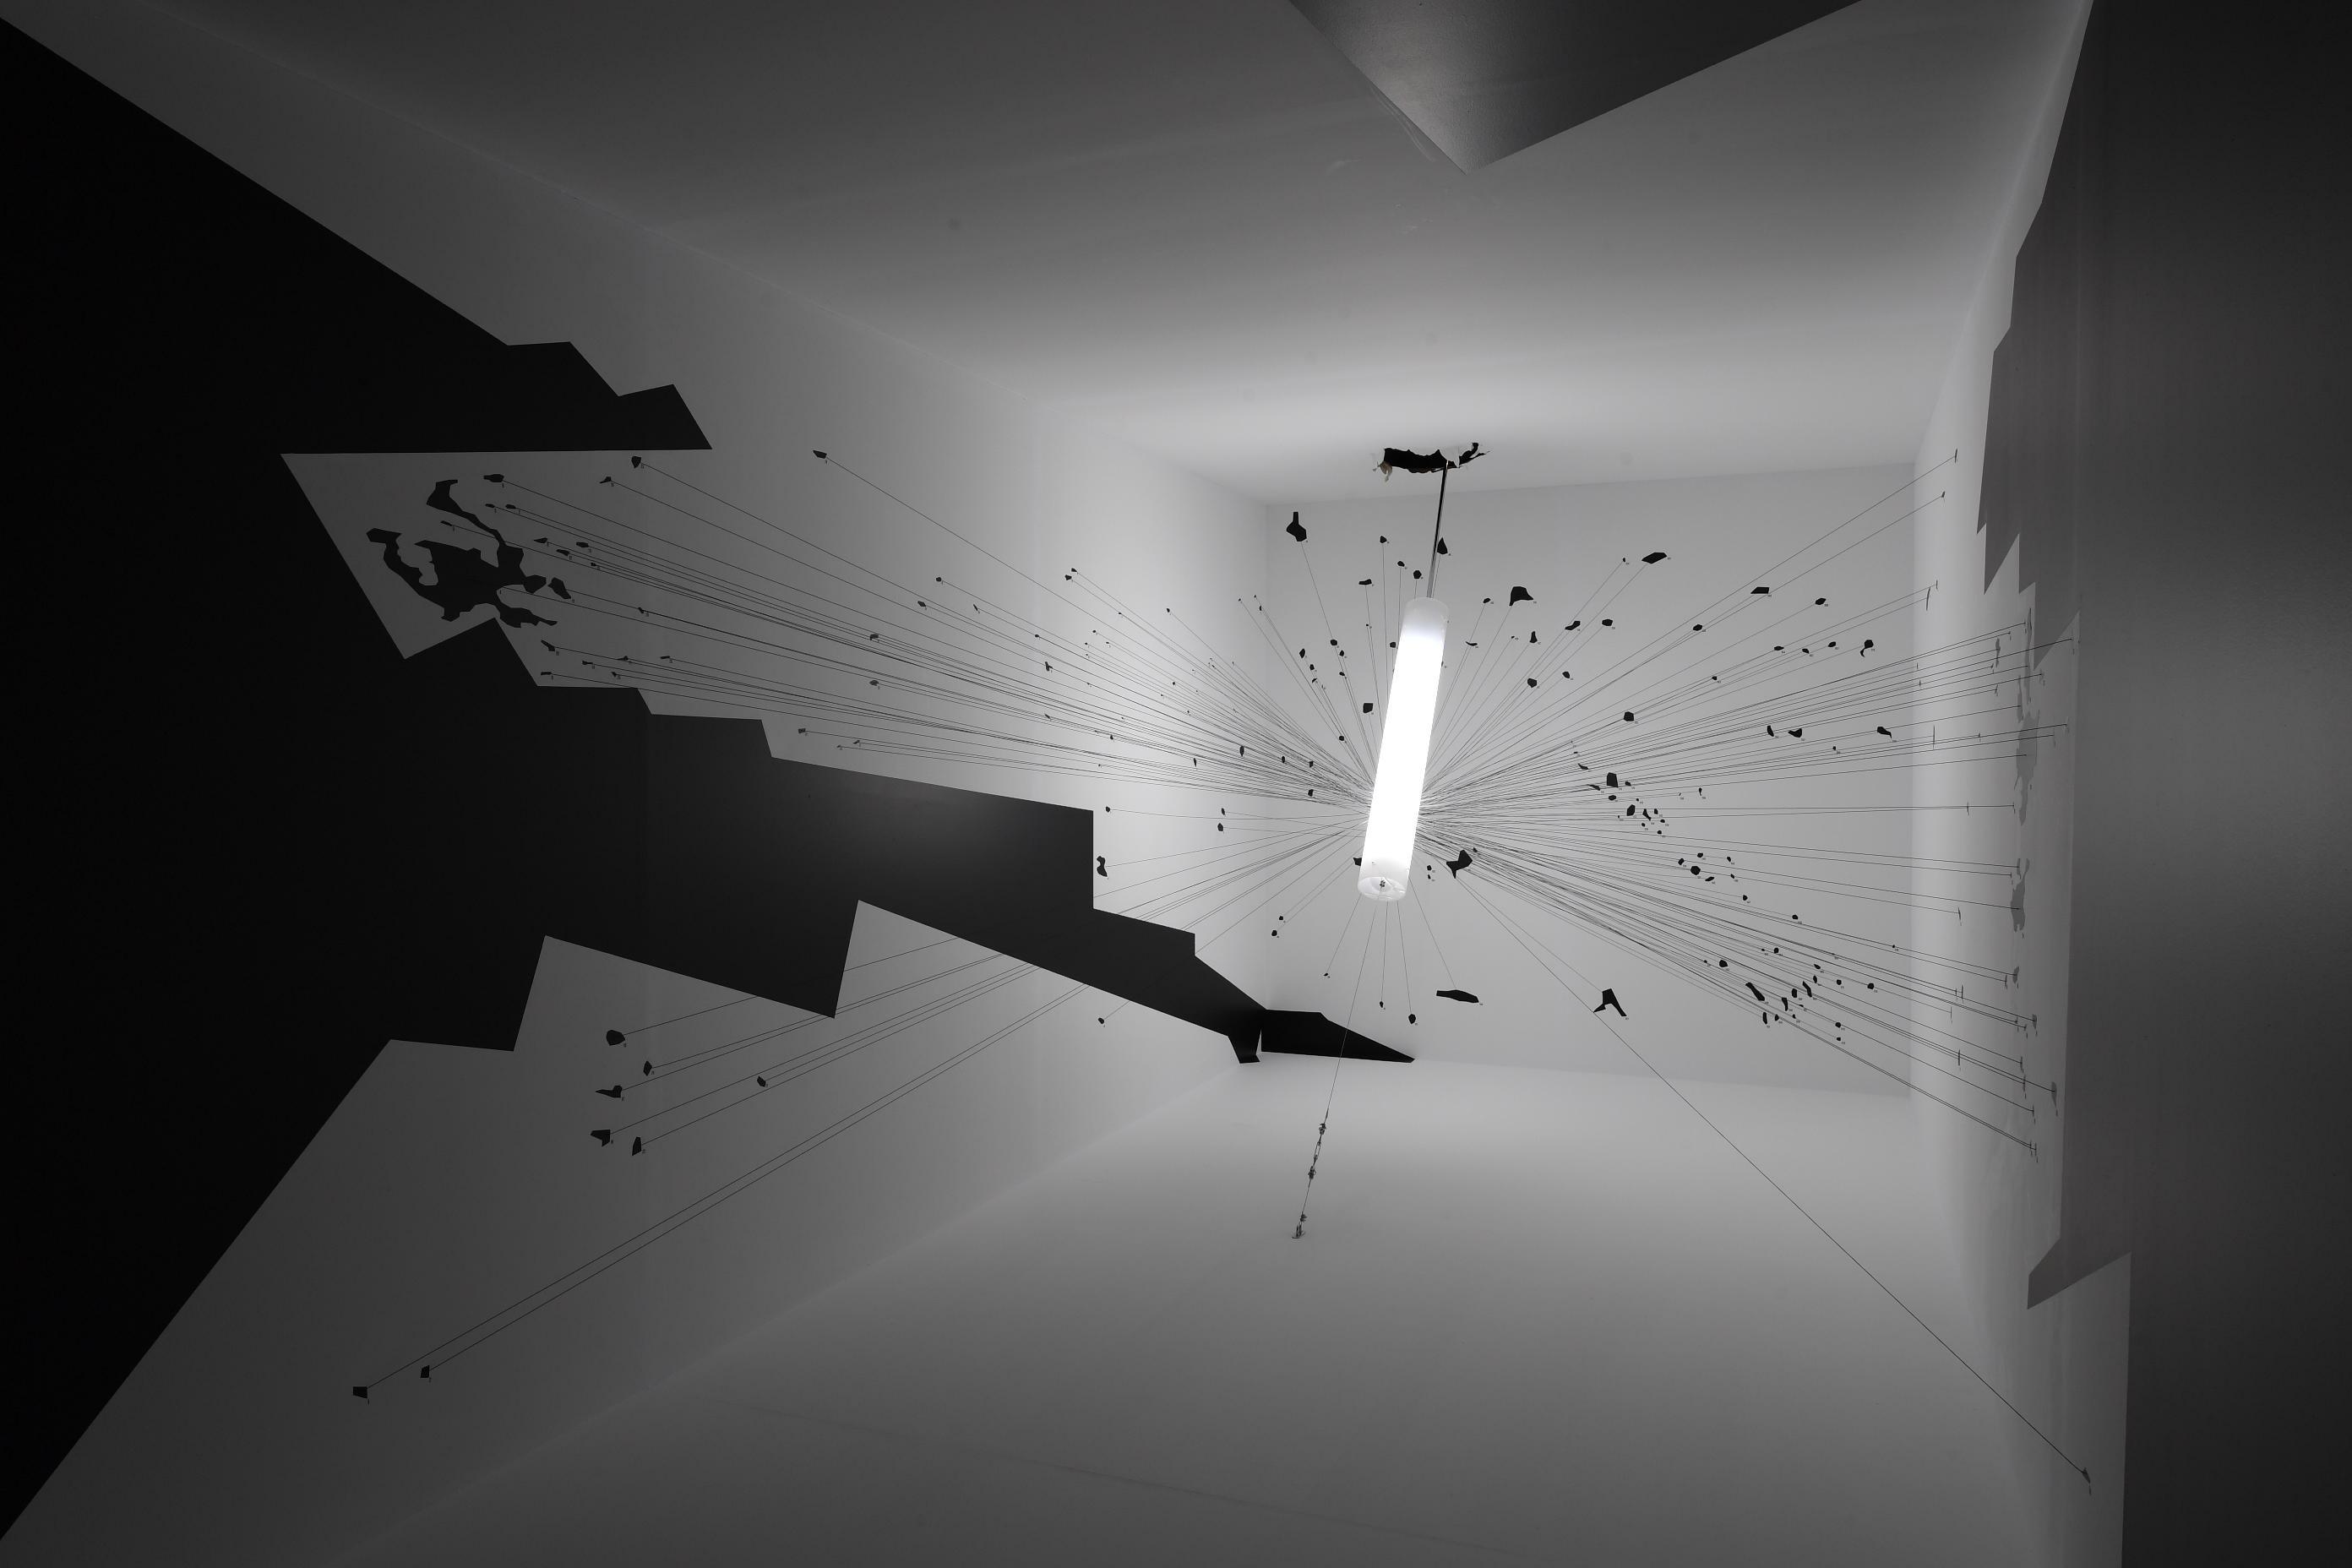 Vista de la exposición Forensic Architecture. Hacia una estétitca investigativa. MACBA, 2017. Foto: Miquel Coll.